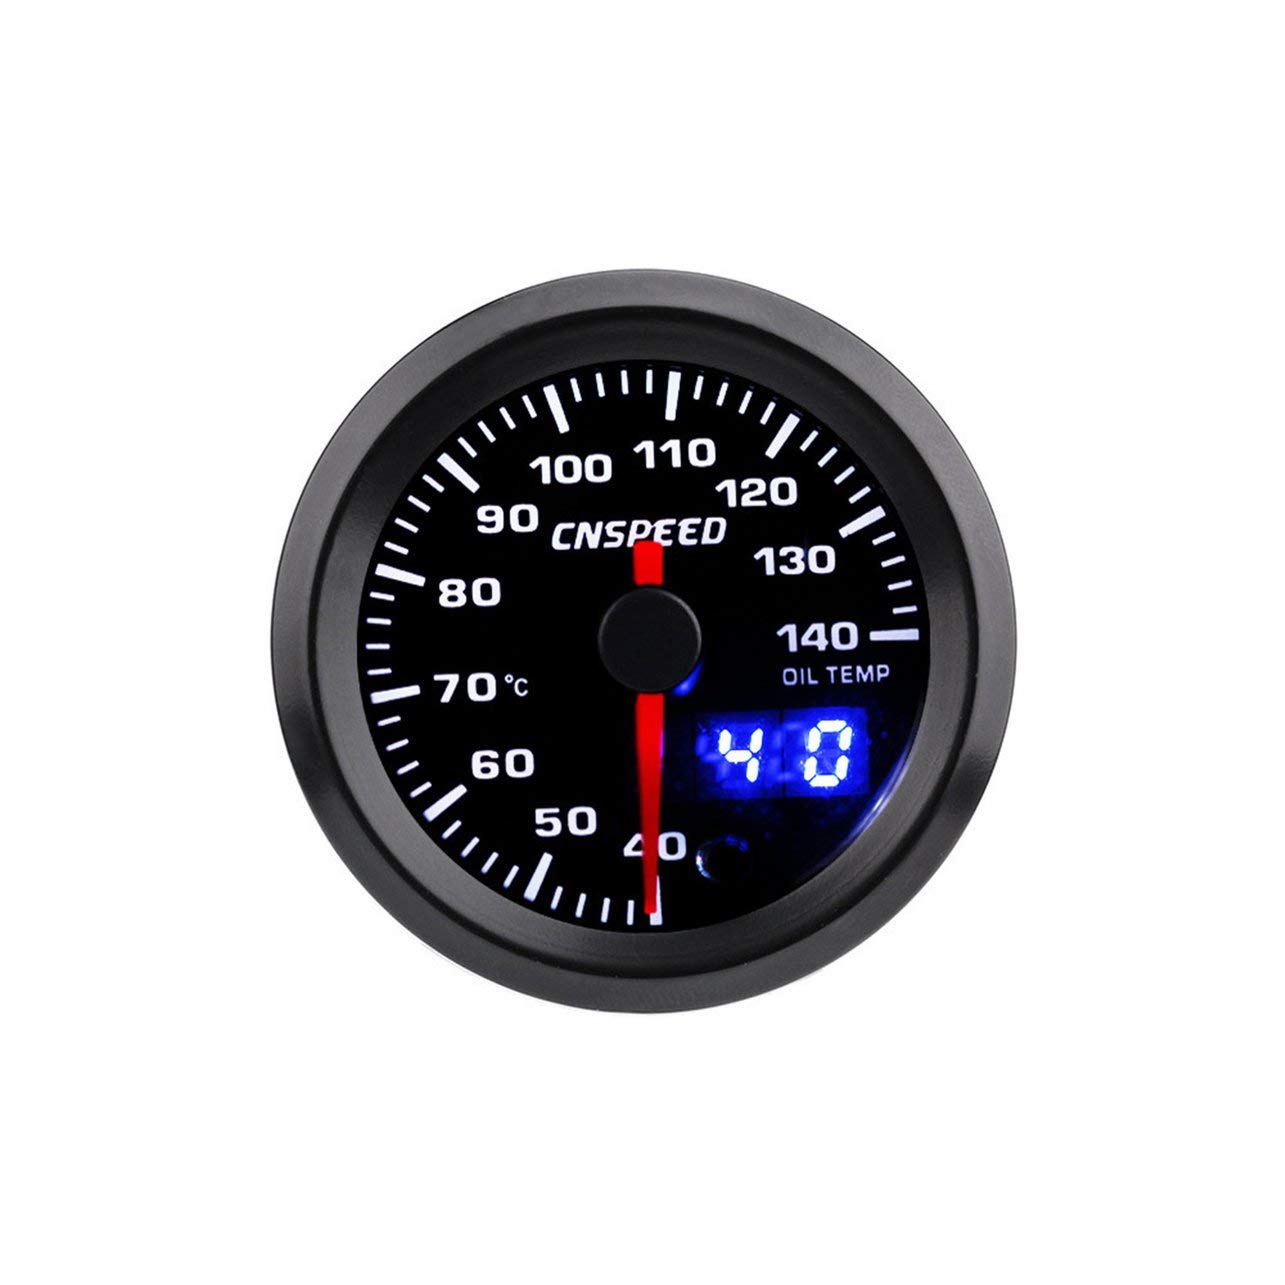 WOSOSYEYO CNSPEED 7 Colores LED Indicador Digital Auto Car Oil Temp Gauge Meter Car Oil Temperature Gauge con Sensor 40-140 /° C